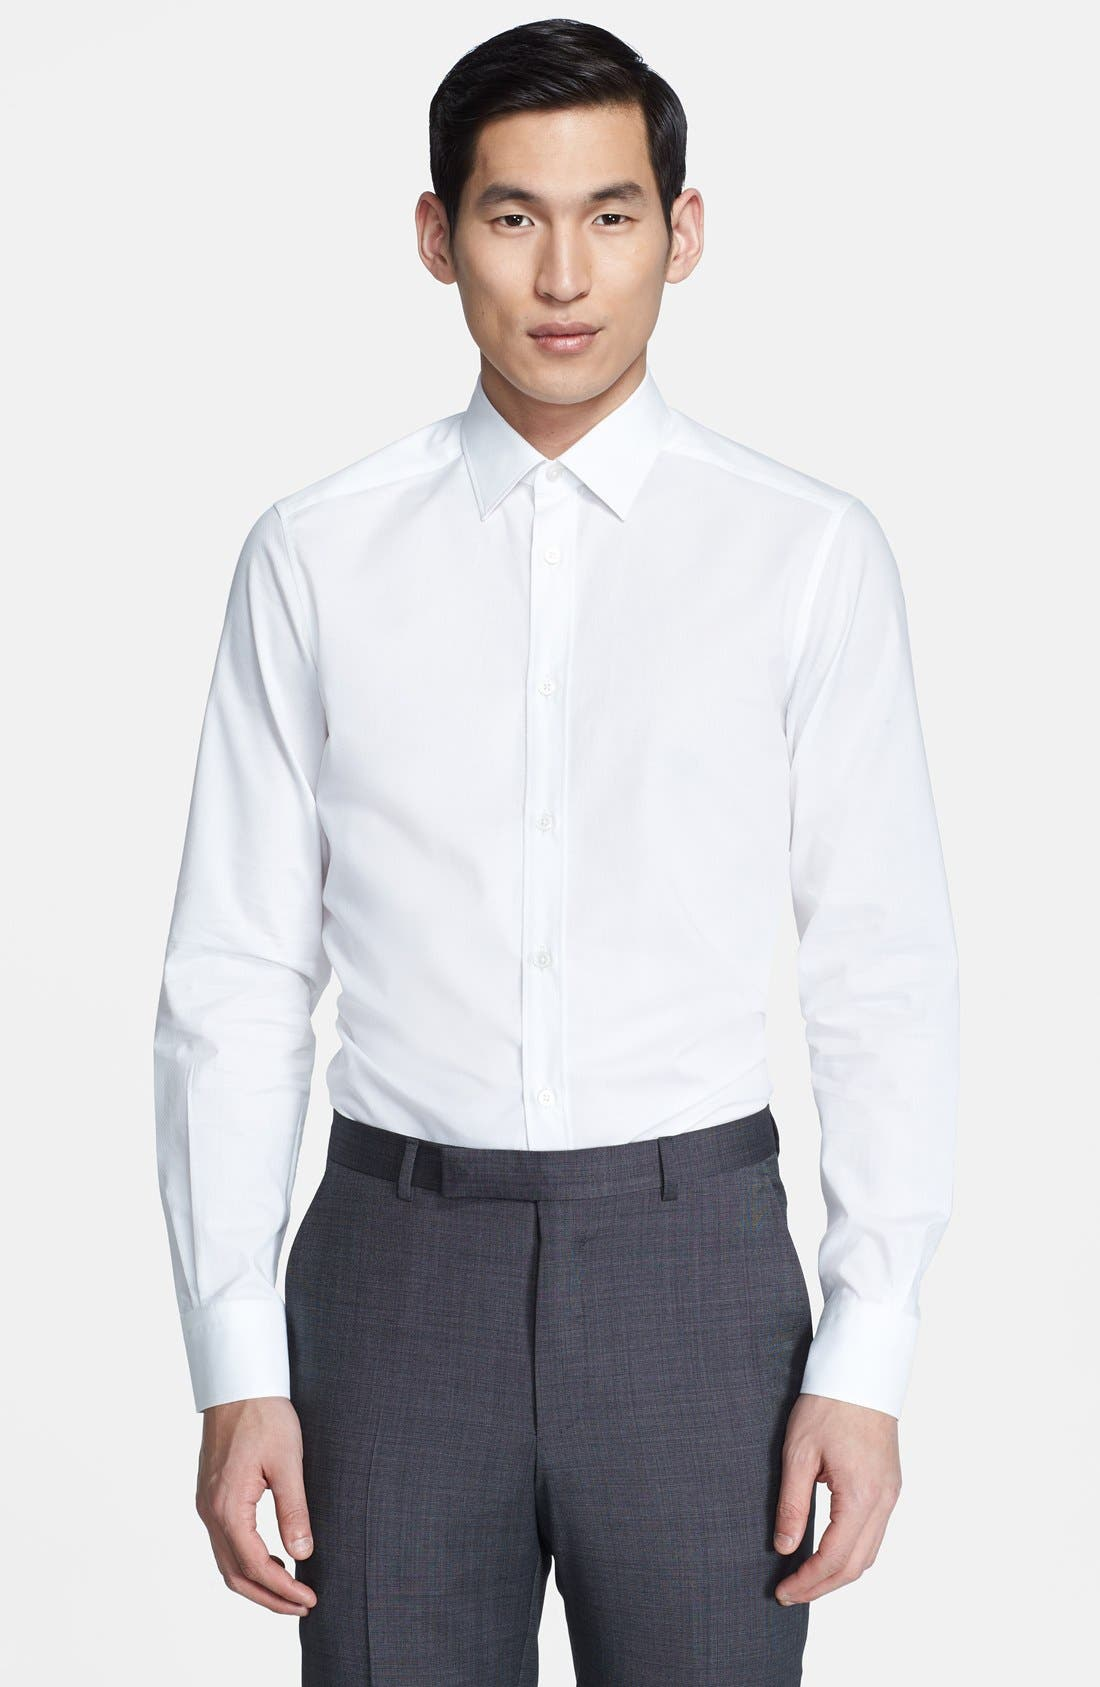 Alternate Image 1 Selected - Z Zegna Drop 8 Fit Tonal Diamond Print Dress Shirt